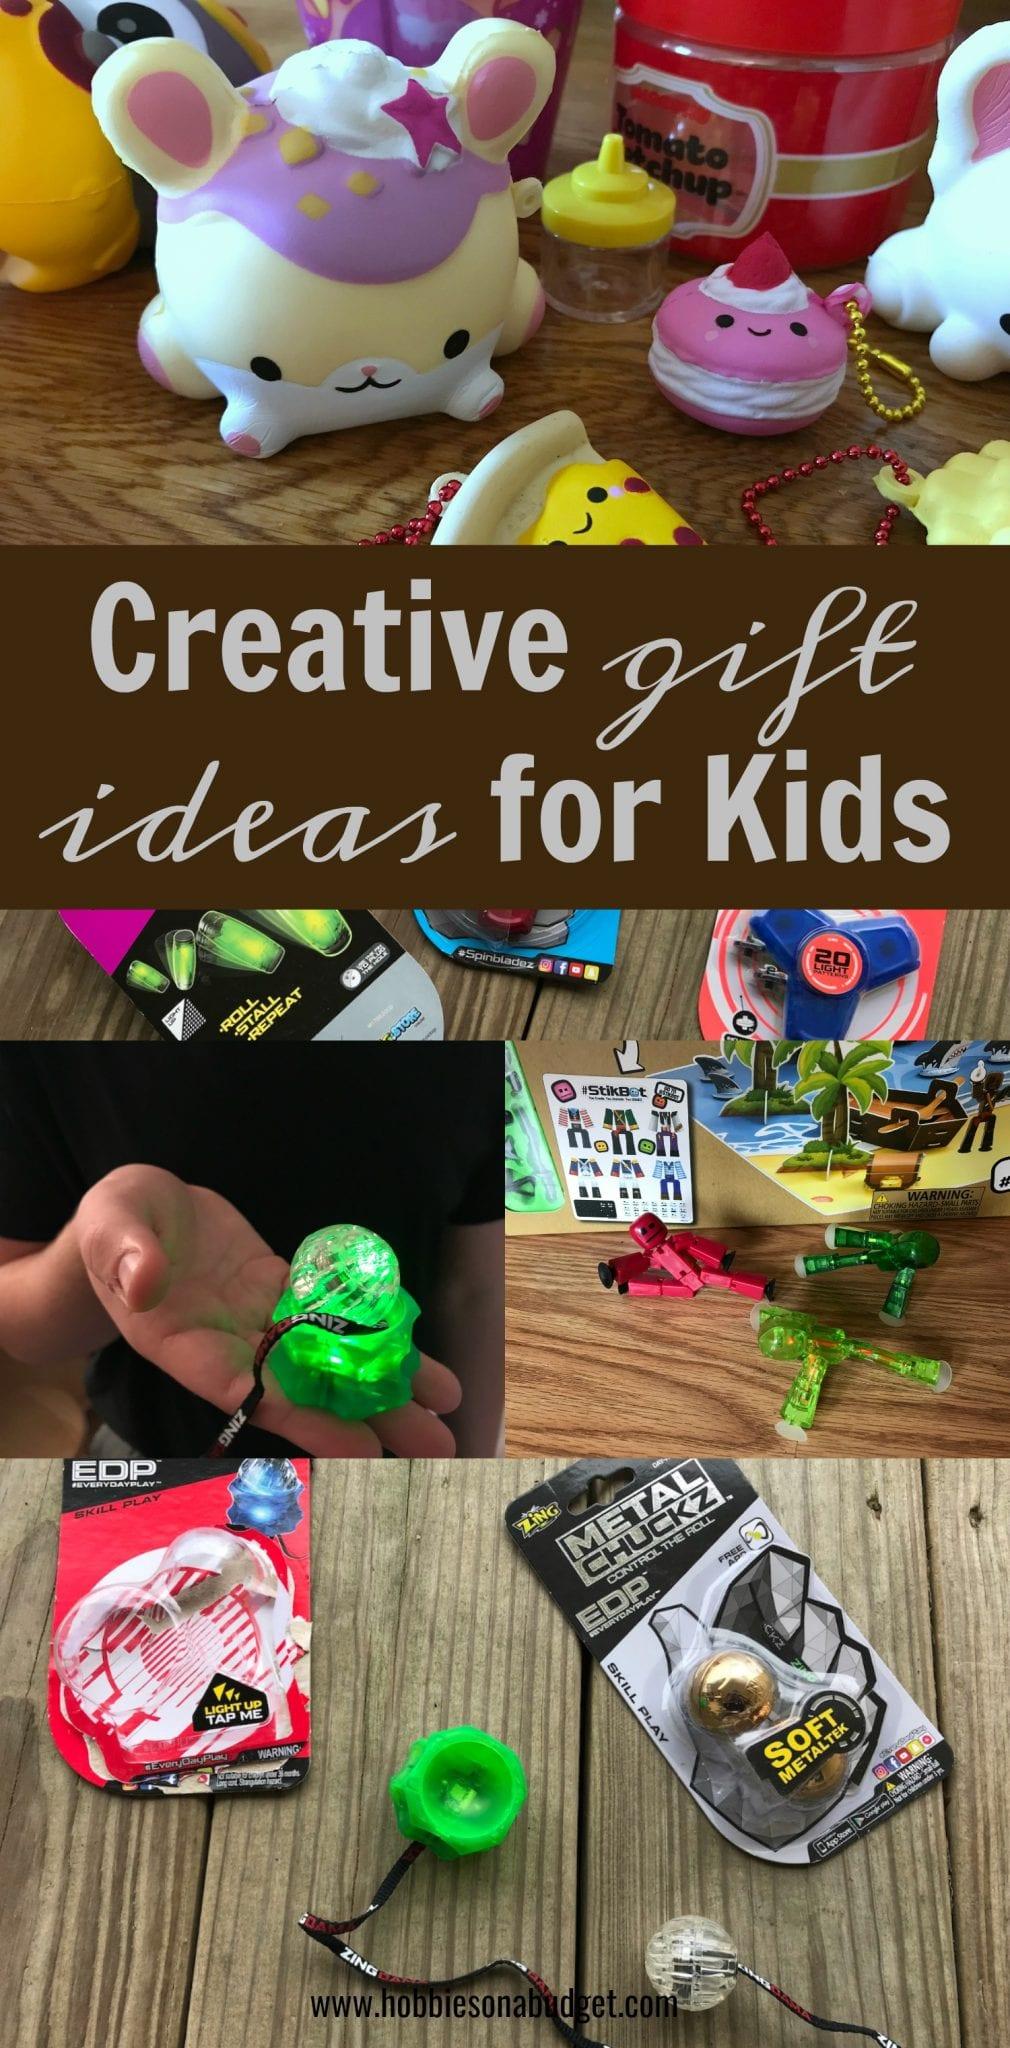 Cushty Kids Hobbies On A Budget Gift Ideas Gift Ideas Friend Gift Ideas Kids Gift Ideas Sister ideas Creative Gift Ideas